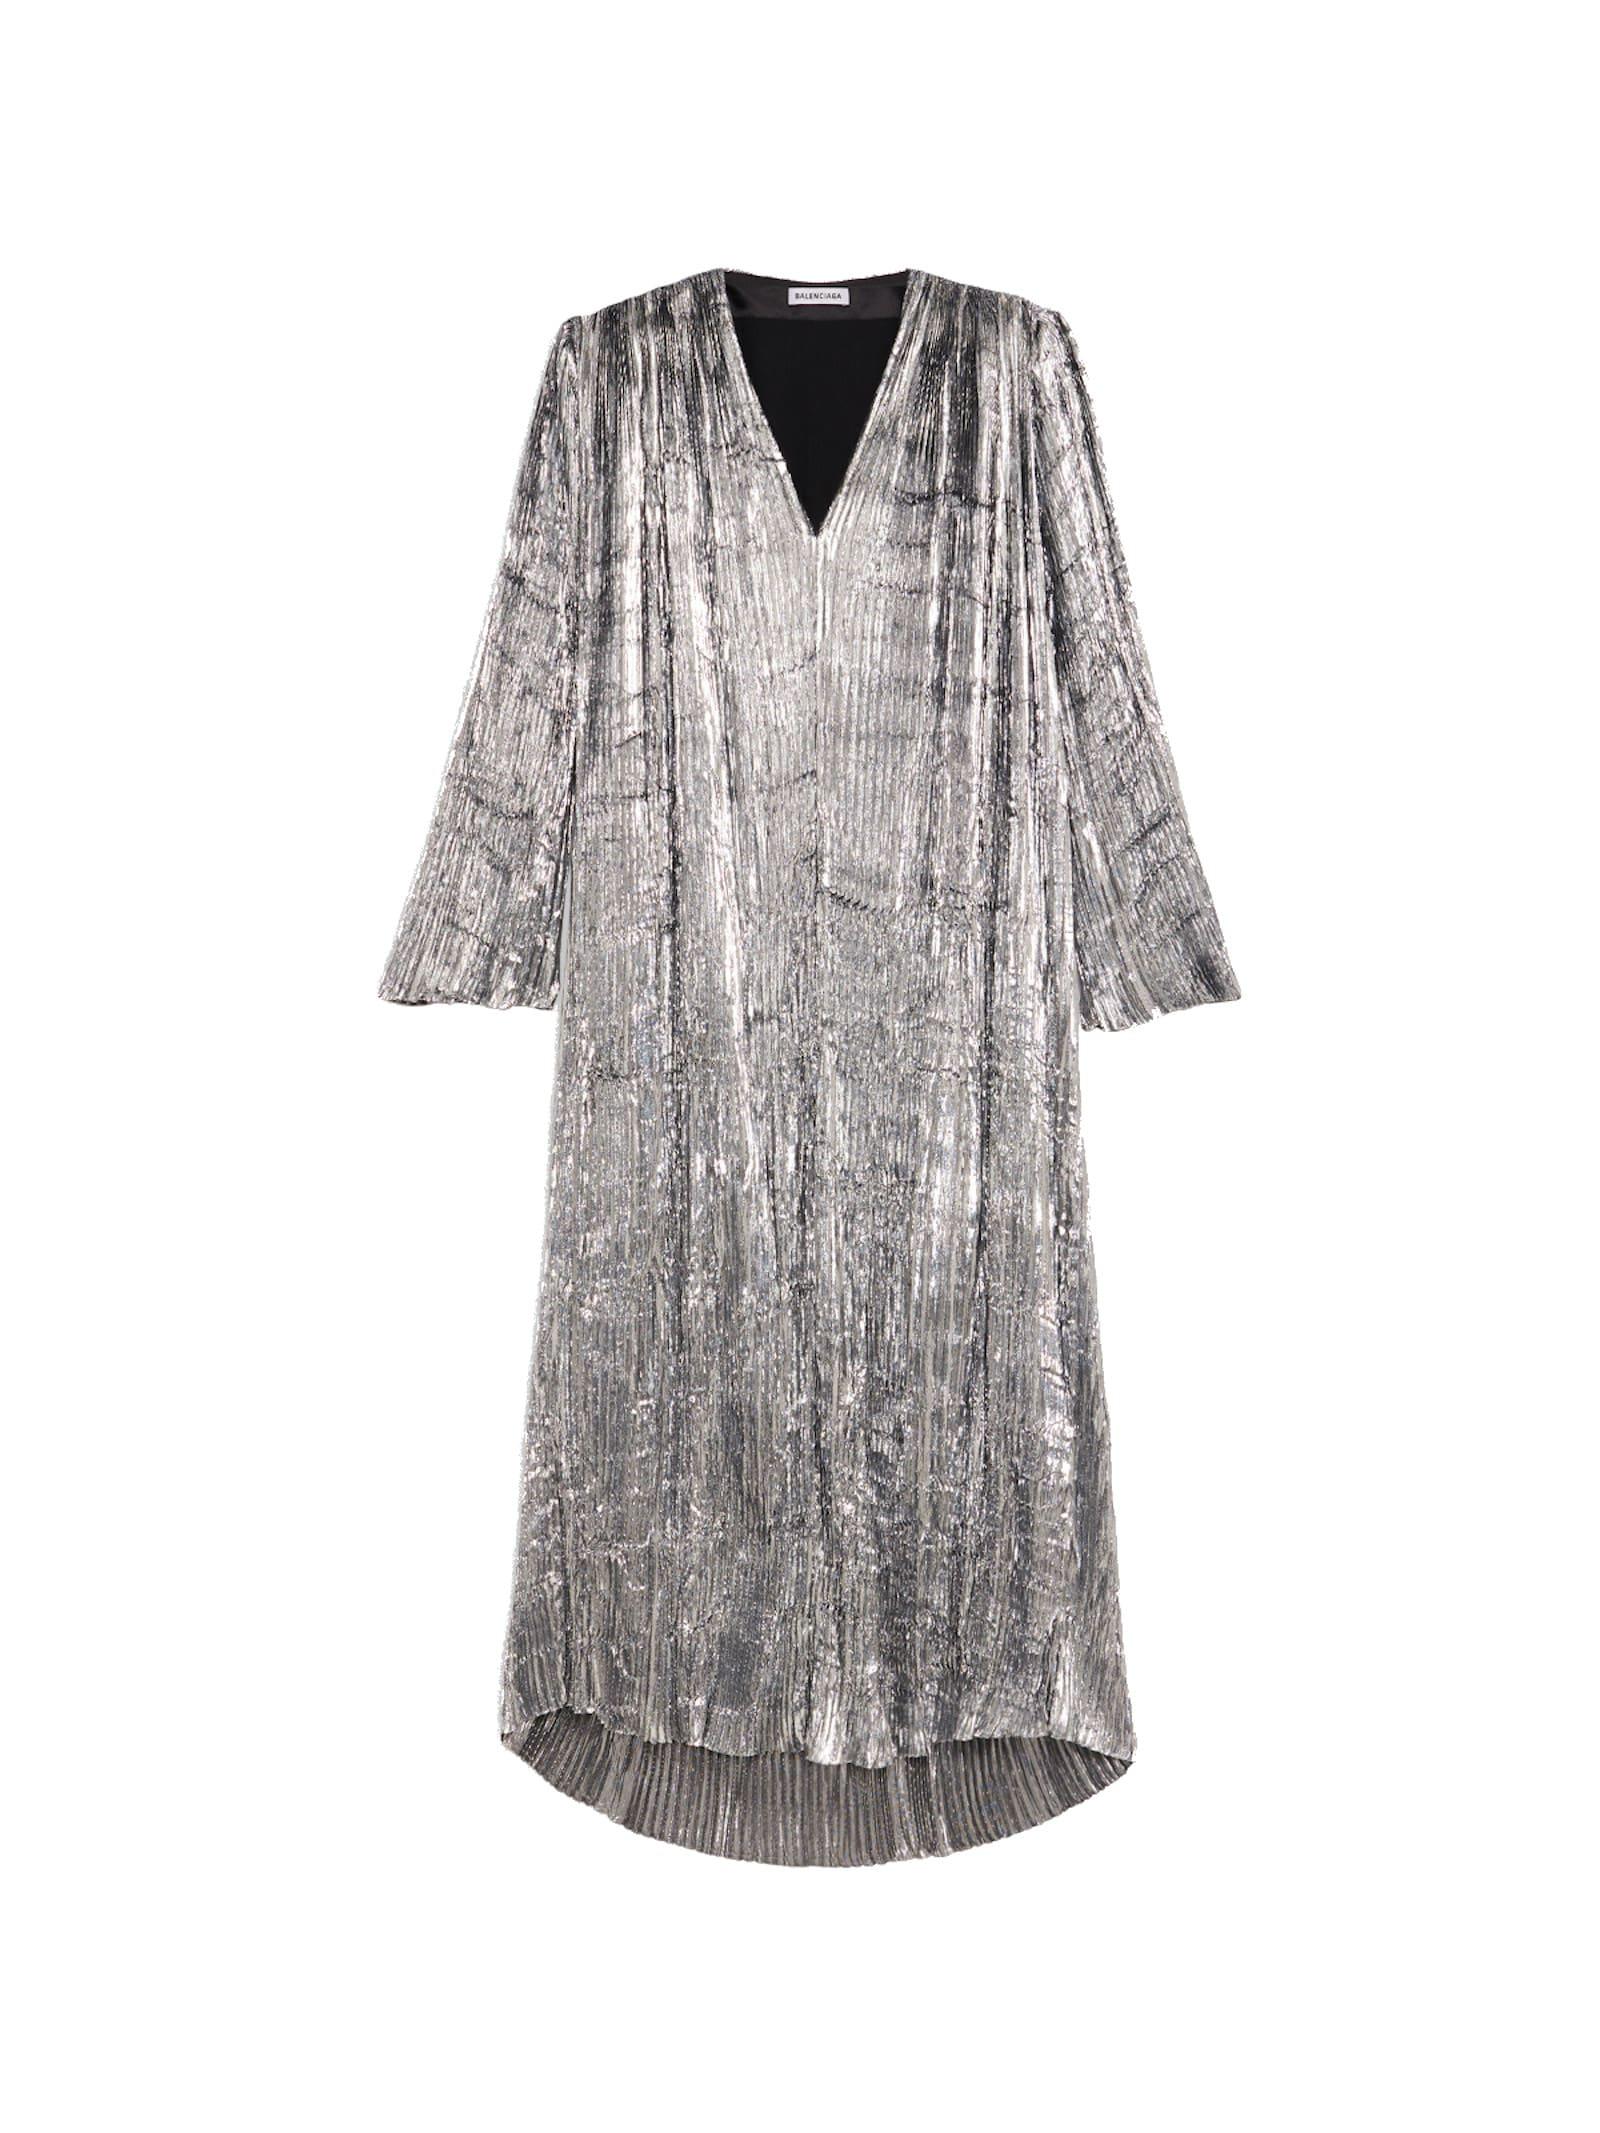 Buy Balenciaga Pleated Dress Long Lurex online, shop Balenciaga with free shipping